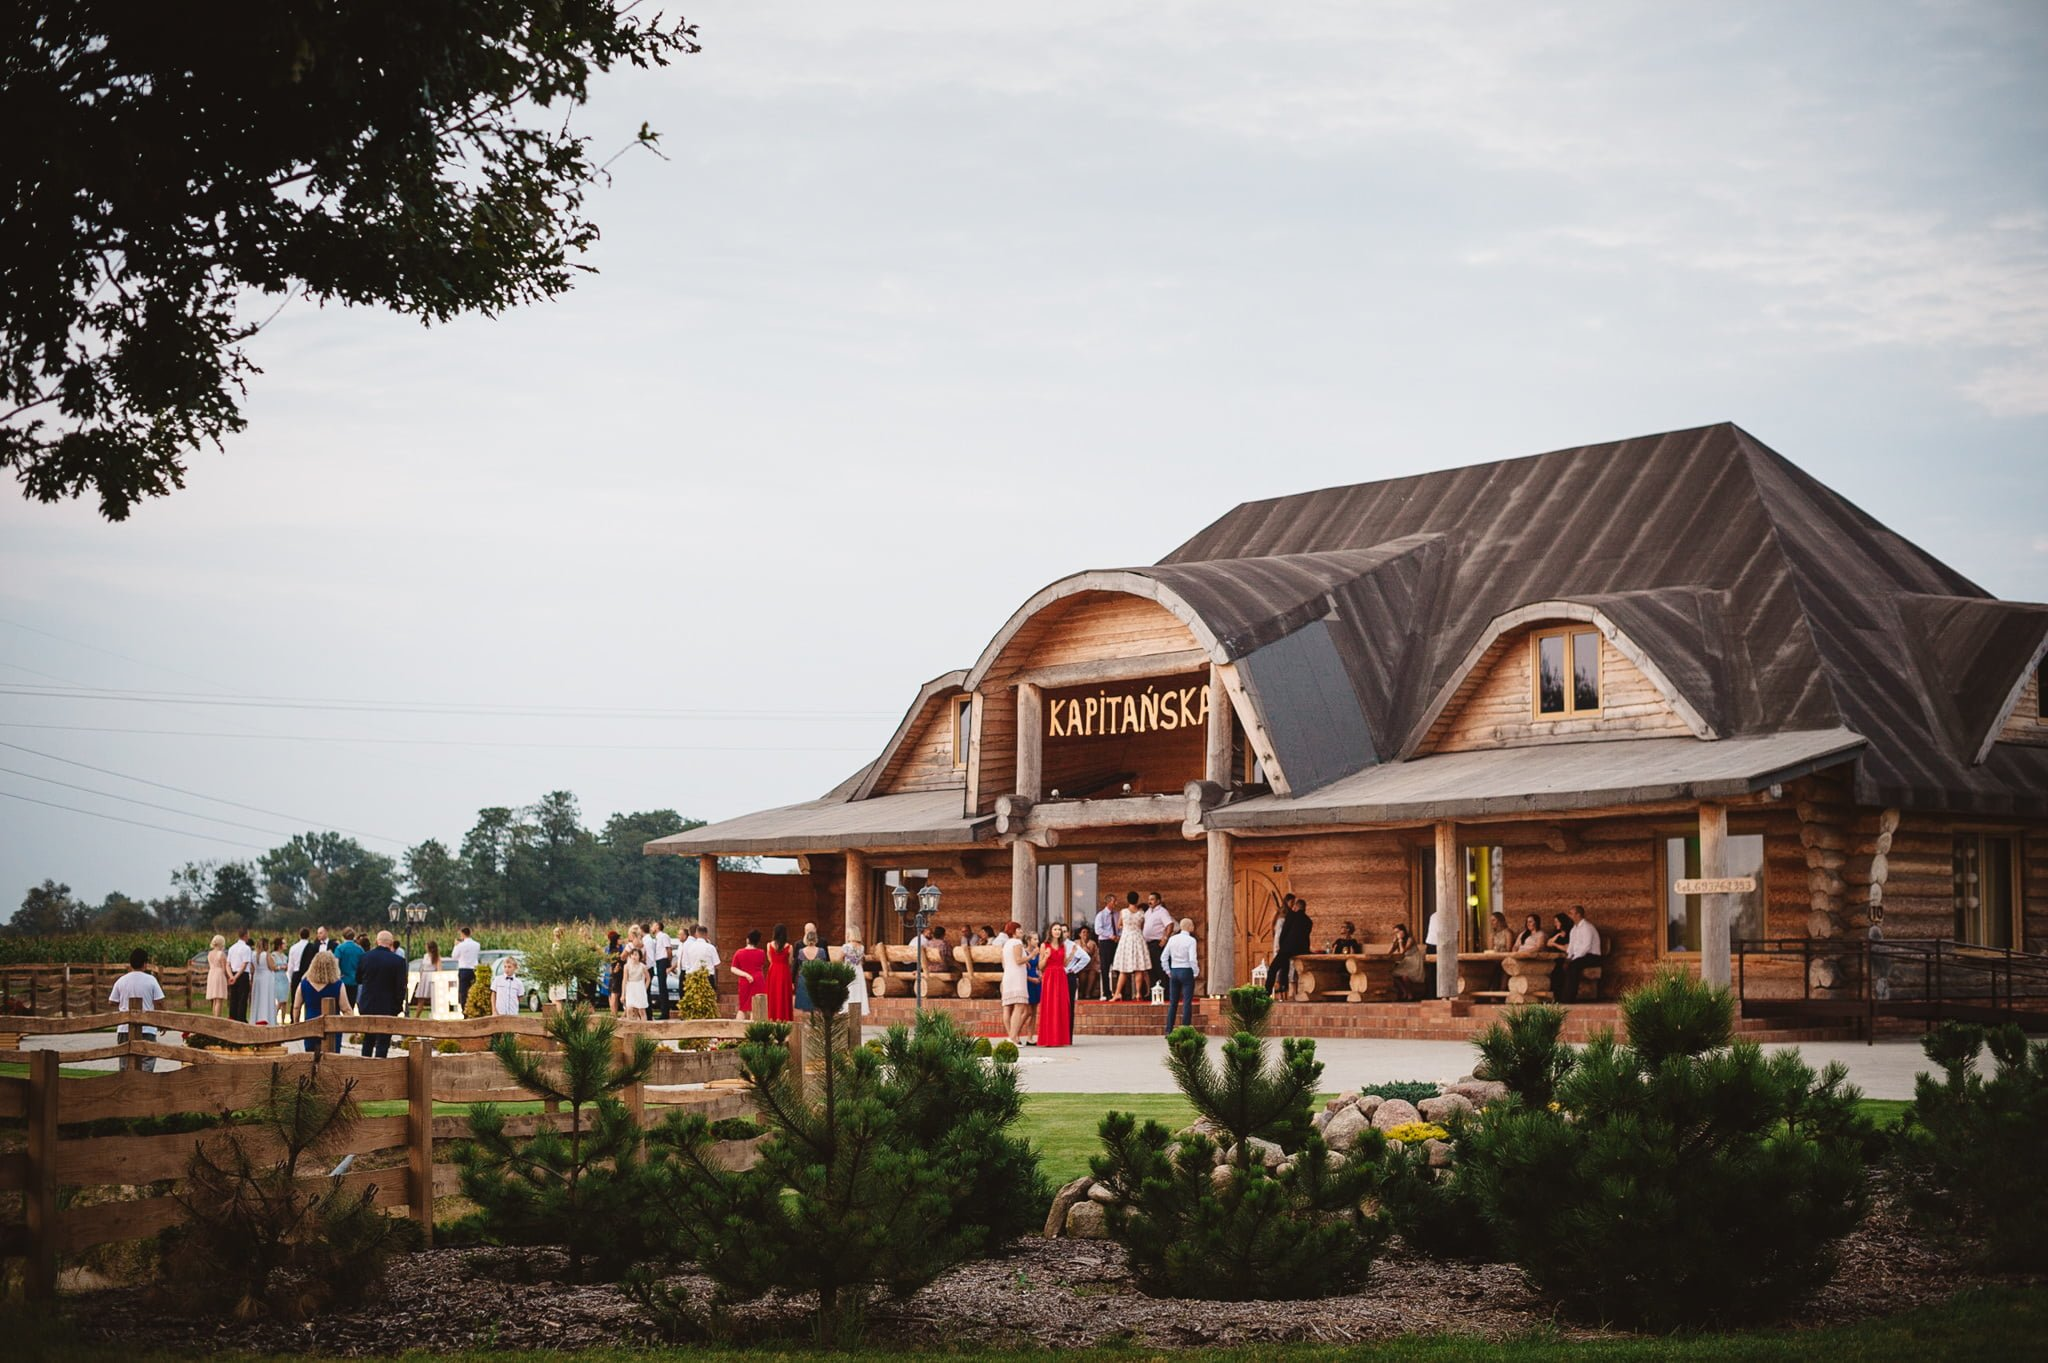 Kapitańska, sala weselna, fotografia ślubna, super sala, dobra zabawa na weselu,